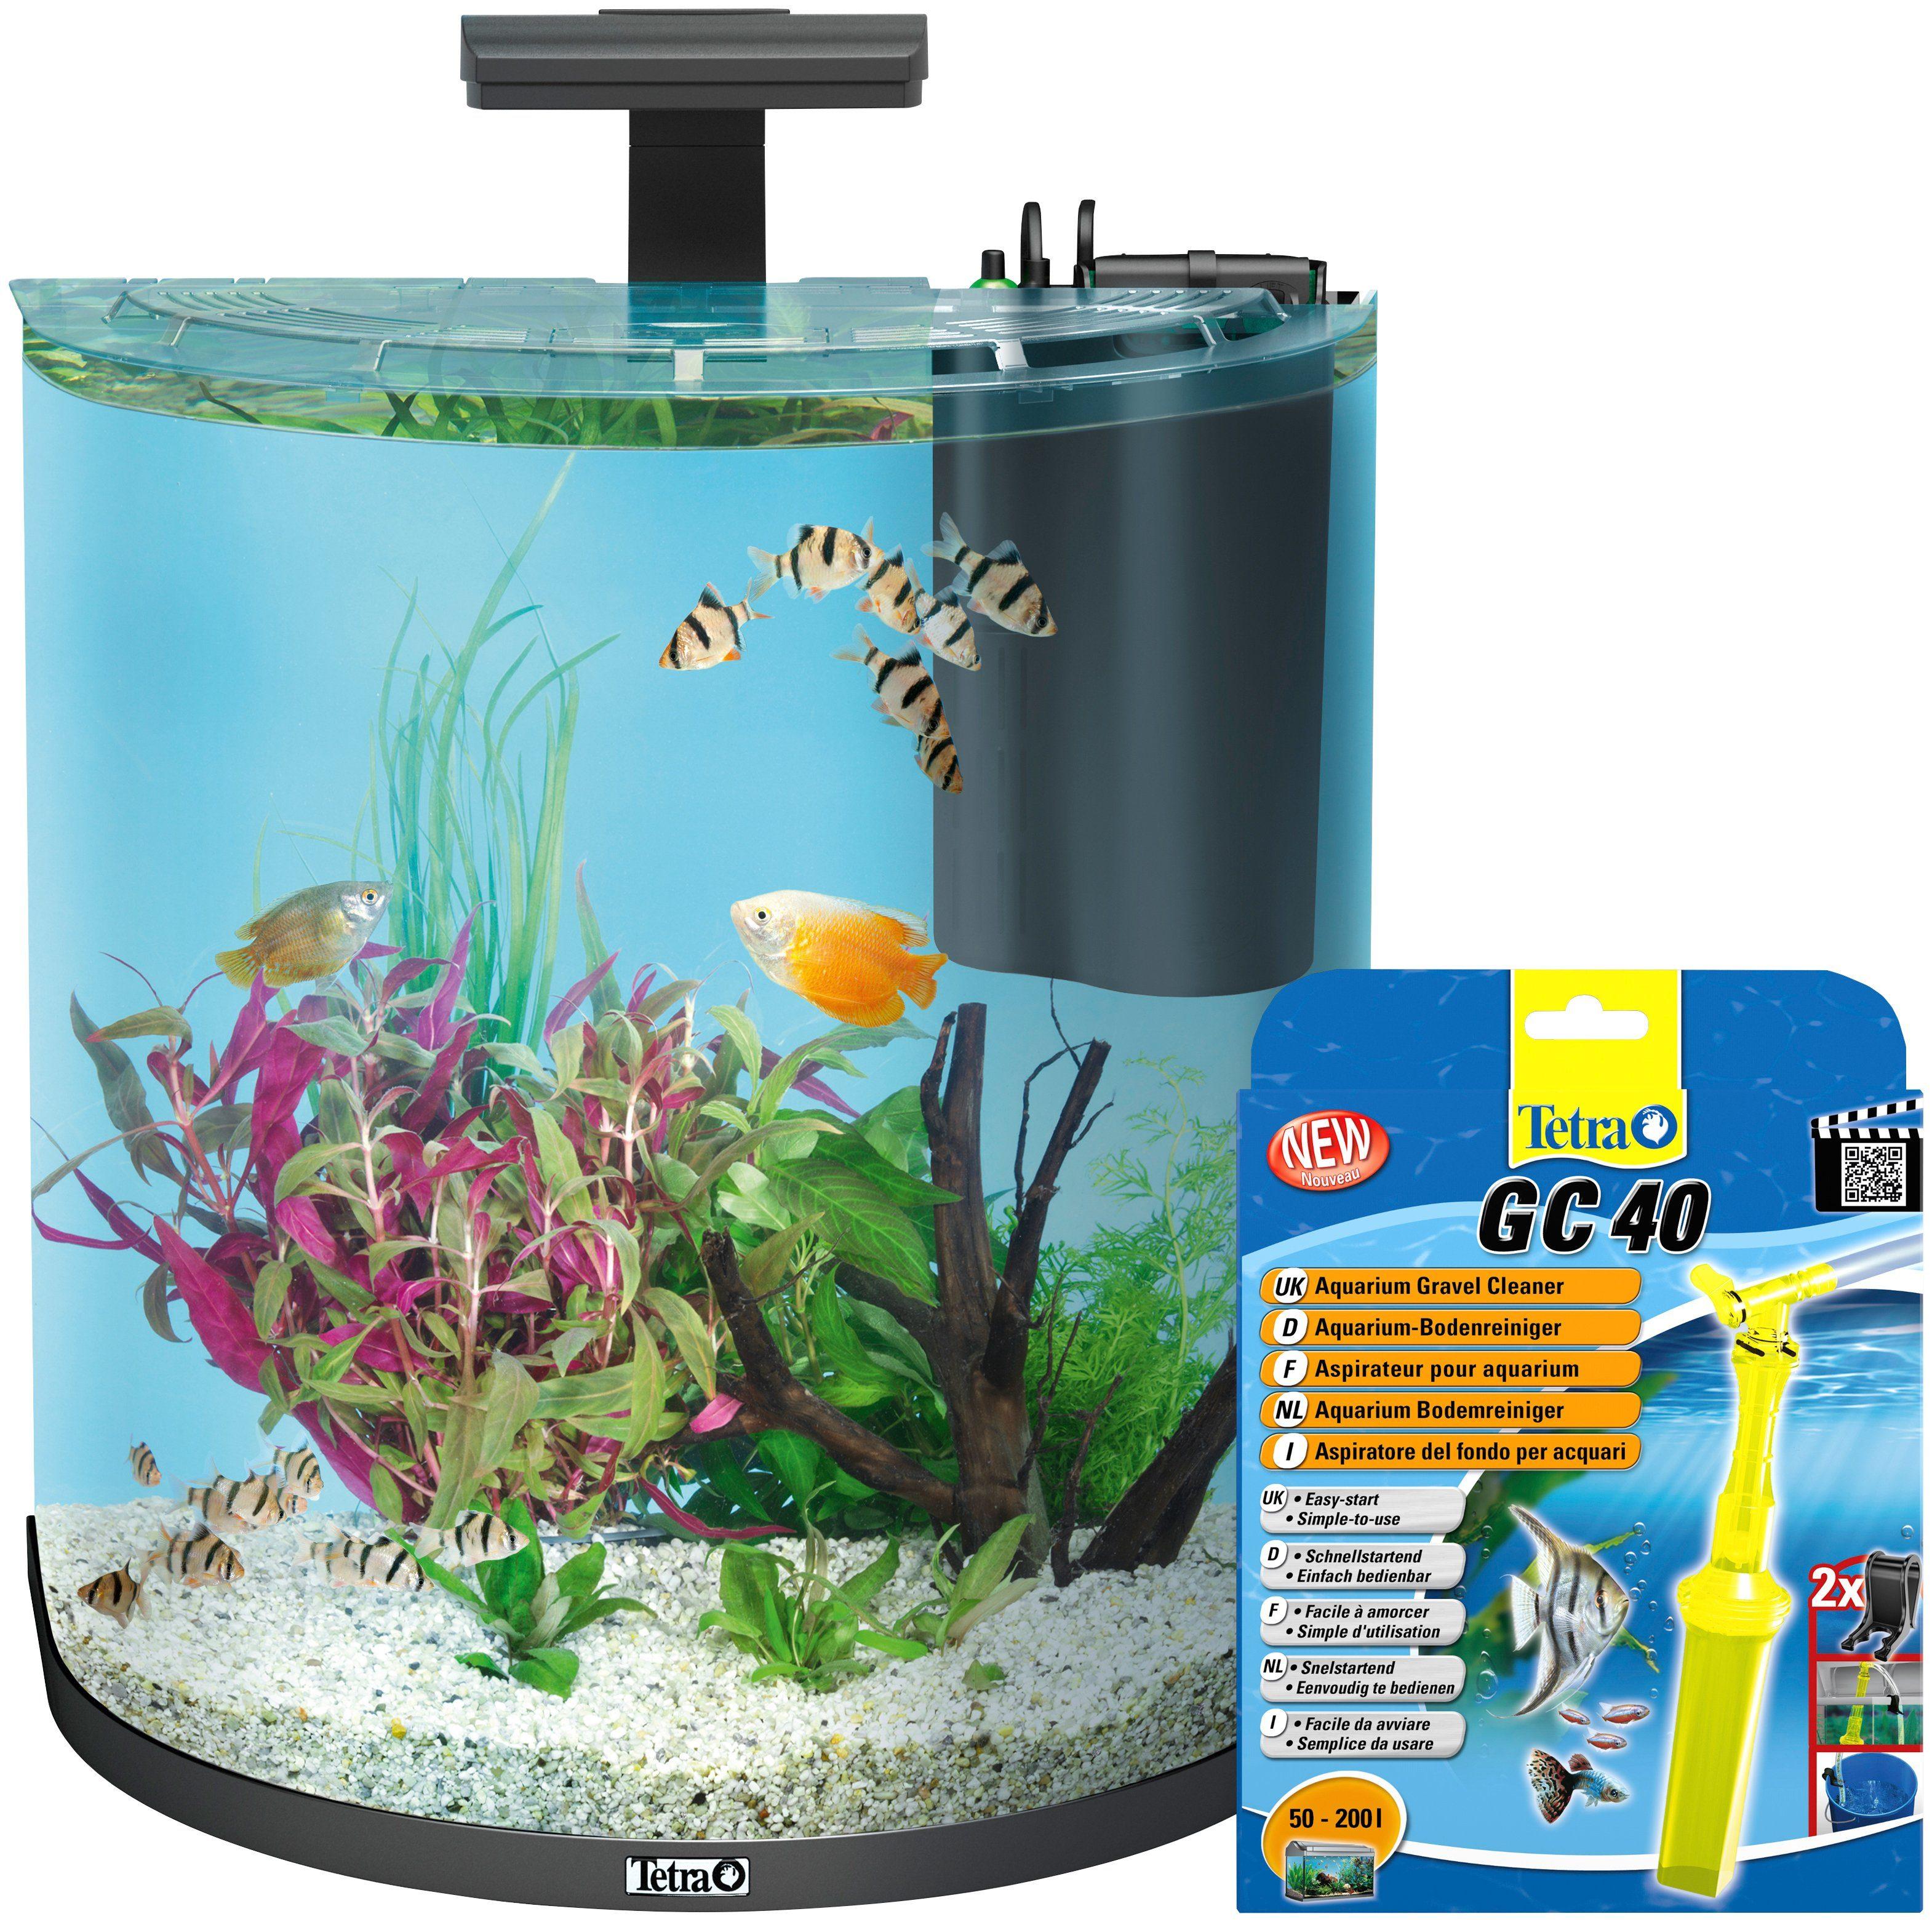 TETRA Aquarien-Set »AquaArt LED Explorer Line«, anthrazit, 60 Liter, inkl. GC 40 Bodenreiniger